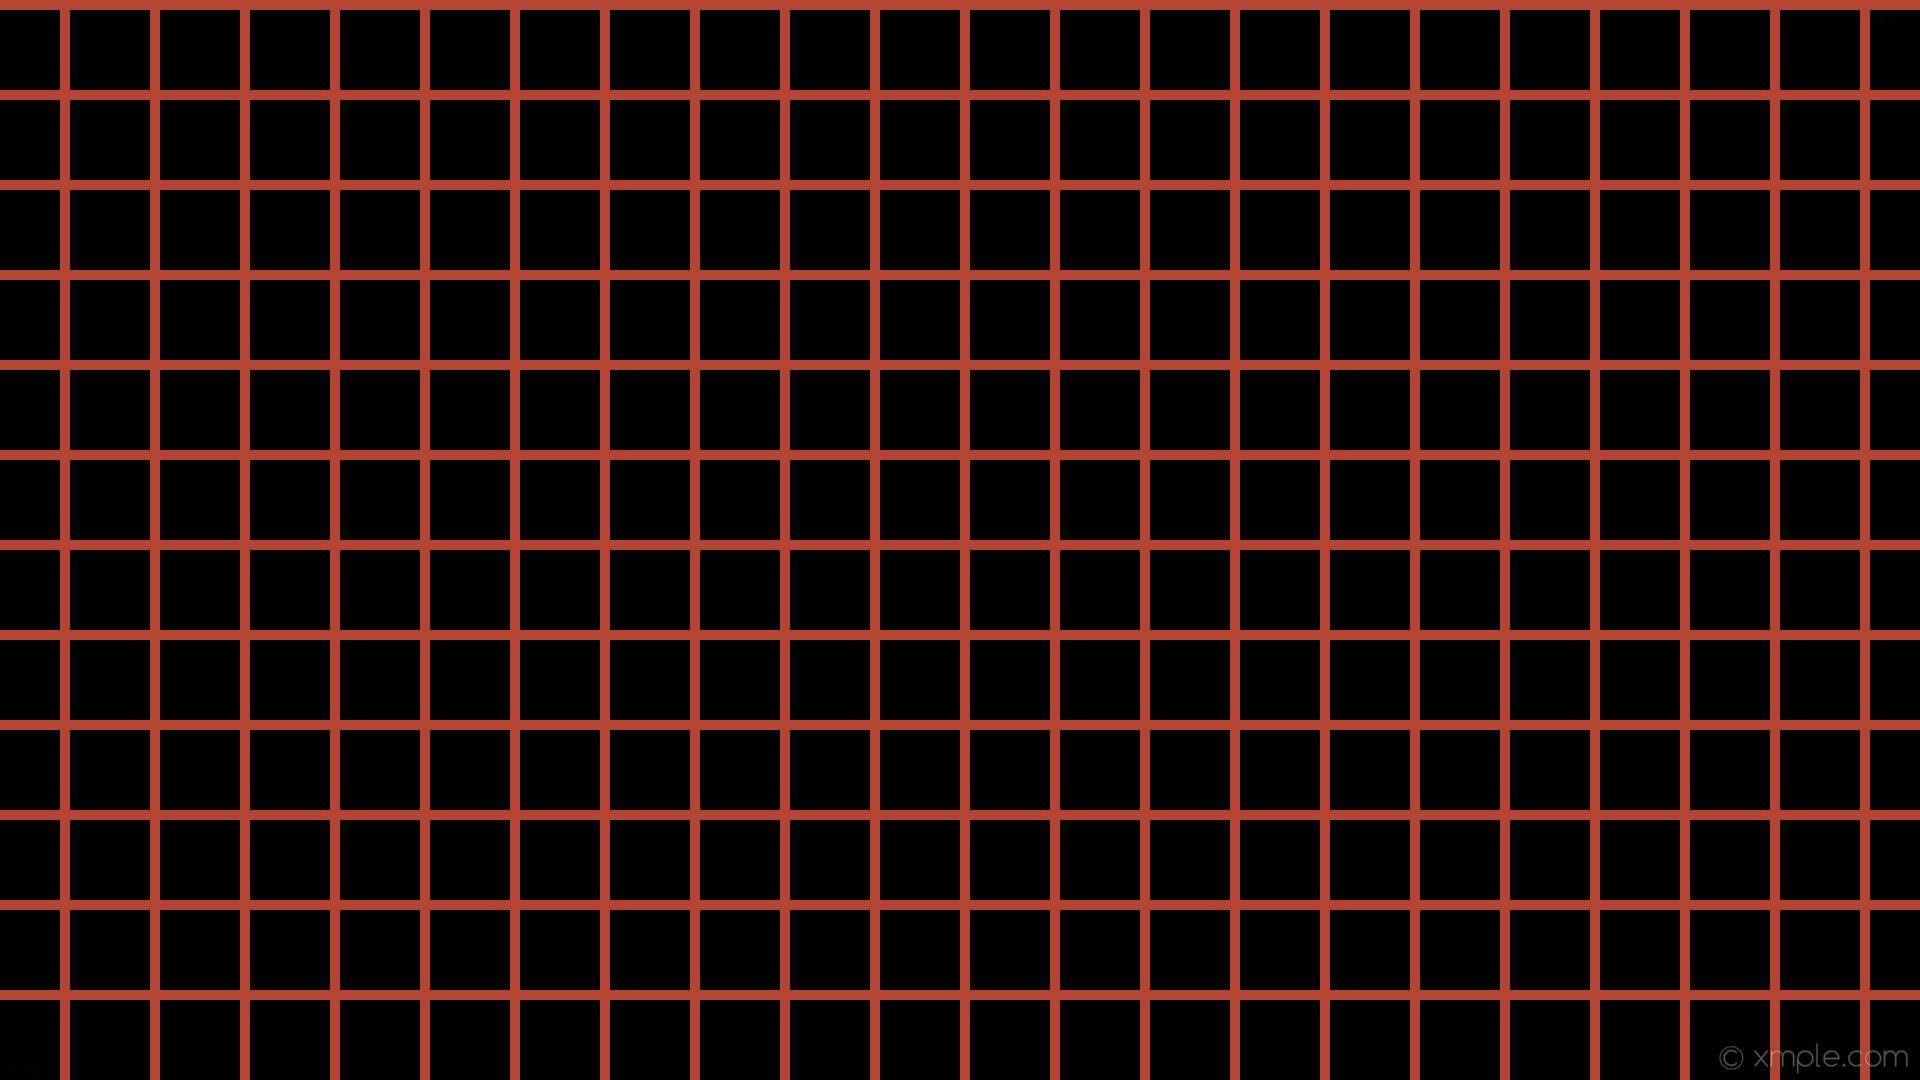 wallpaper graph paper black orange grid tomato #000000 #ff6347 0° 10px 90px